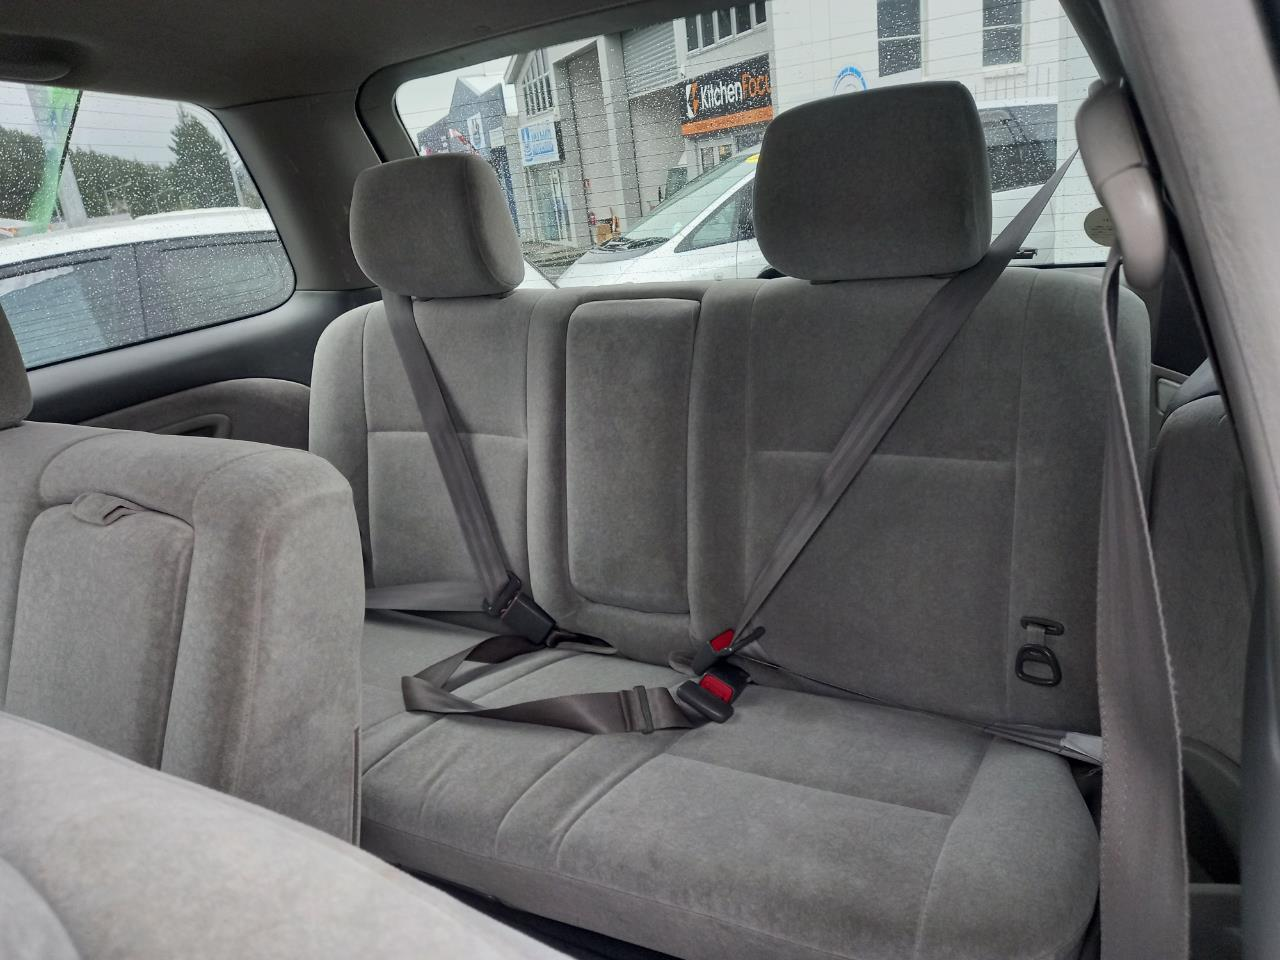 image-9, 2001 Toyota Estima 8 Seats No Deposit Finance at Dunedin